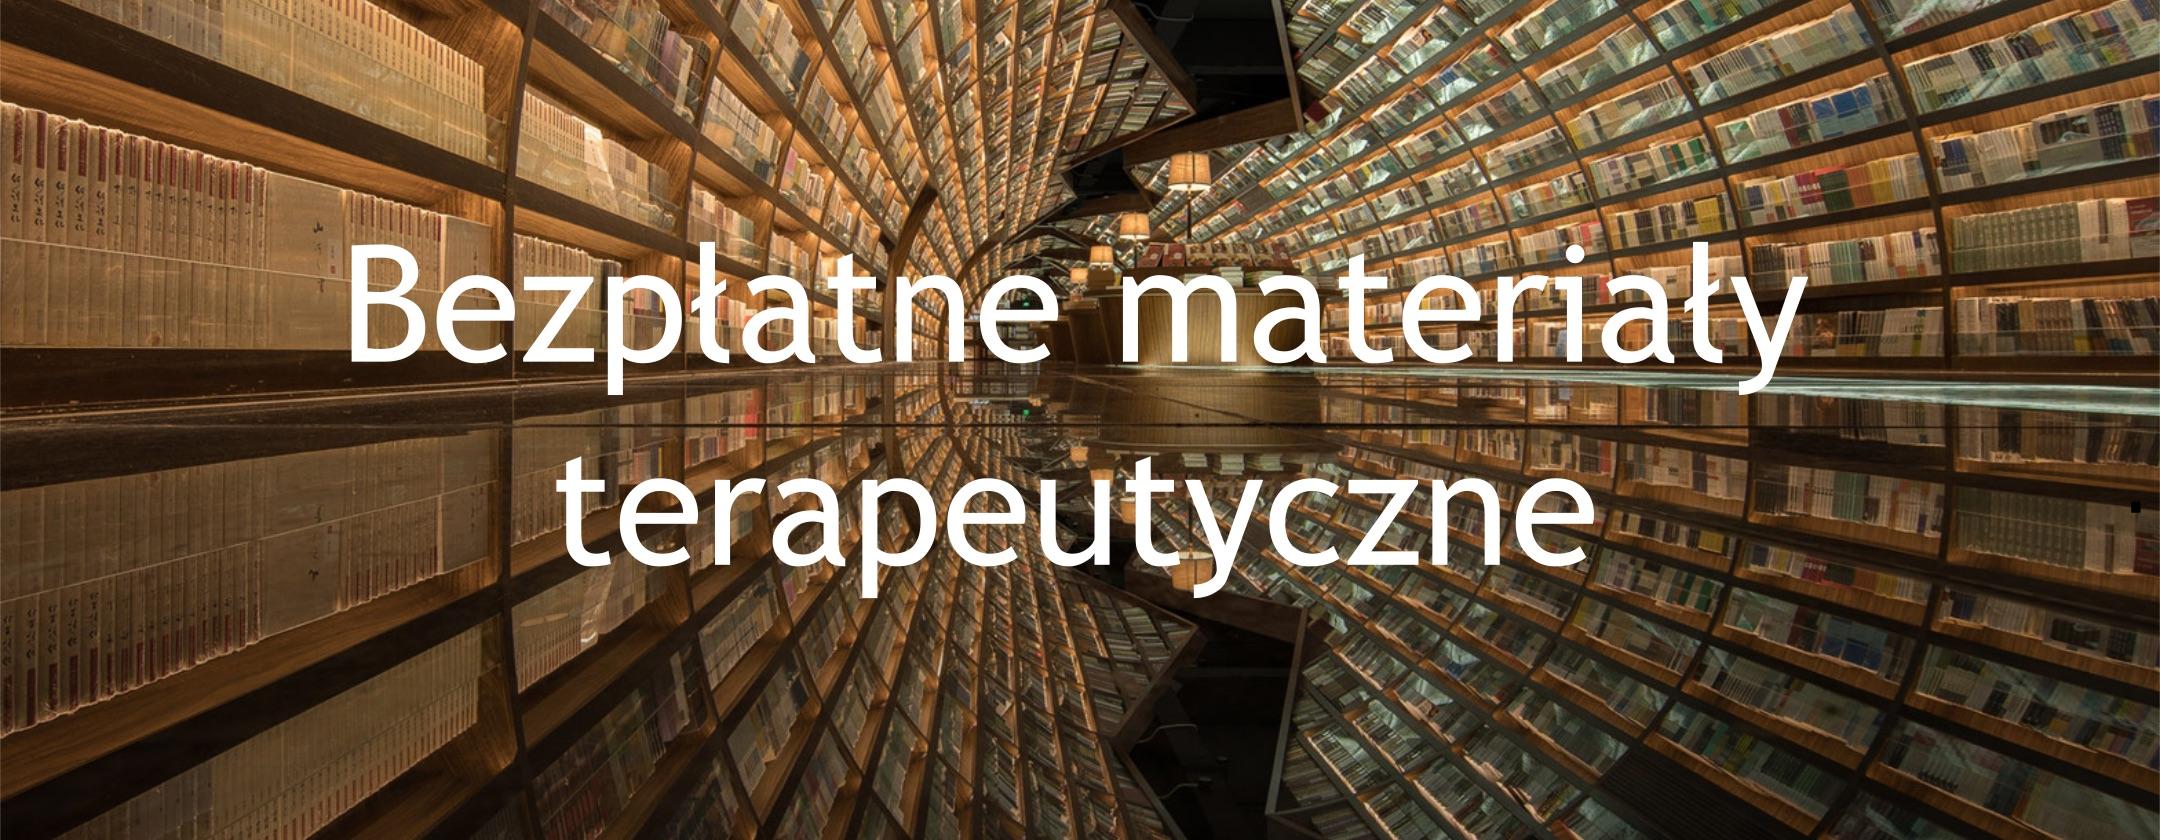 slider-bezplatne-materialy-terapeutyczne